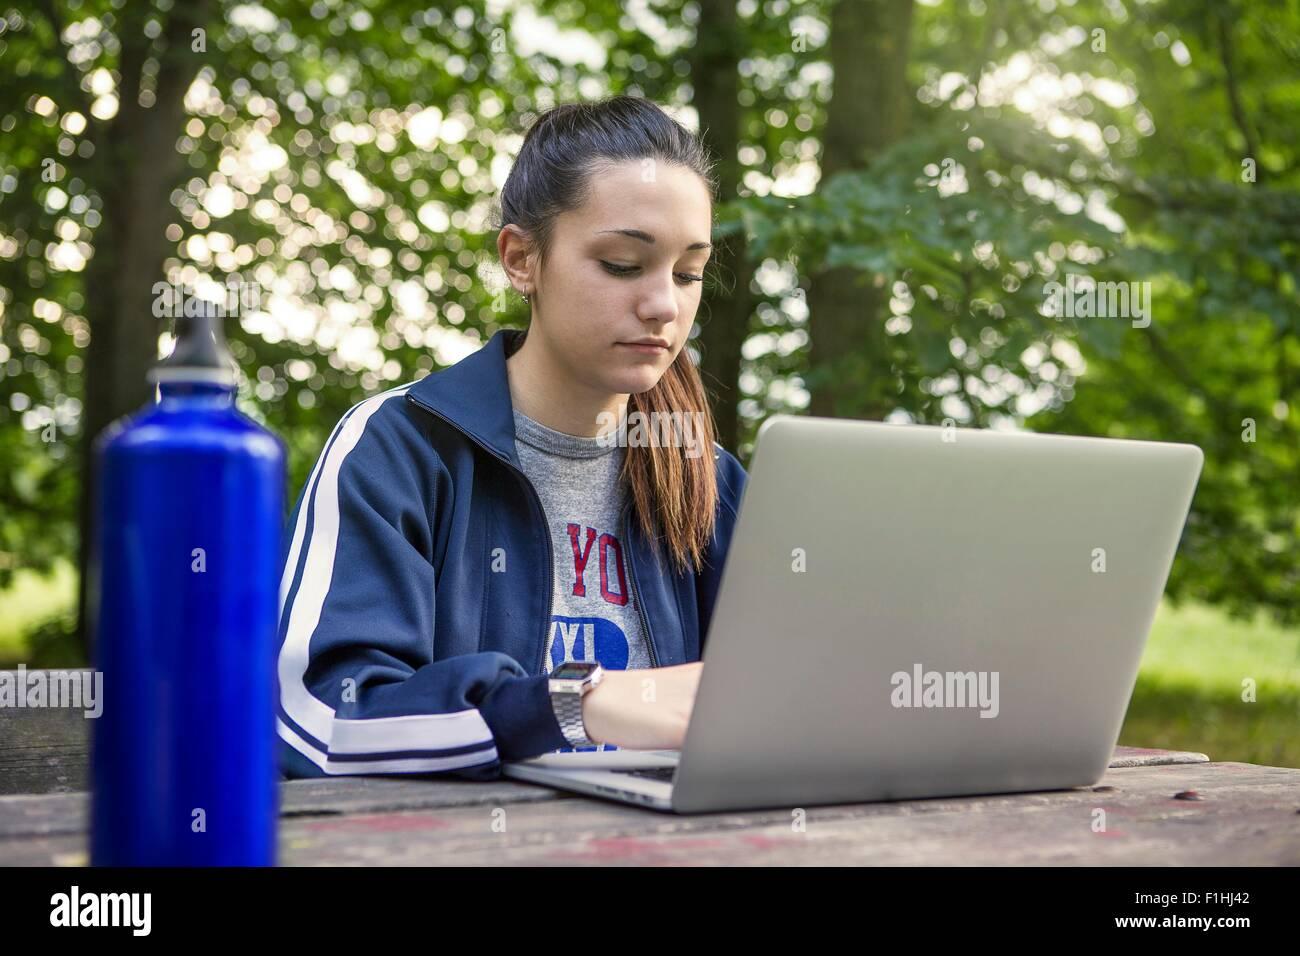 Teenage girl in park using laptop at picnic bench - Stock Image